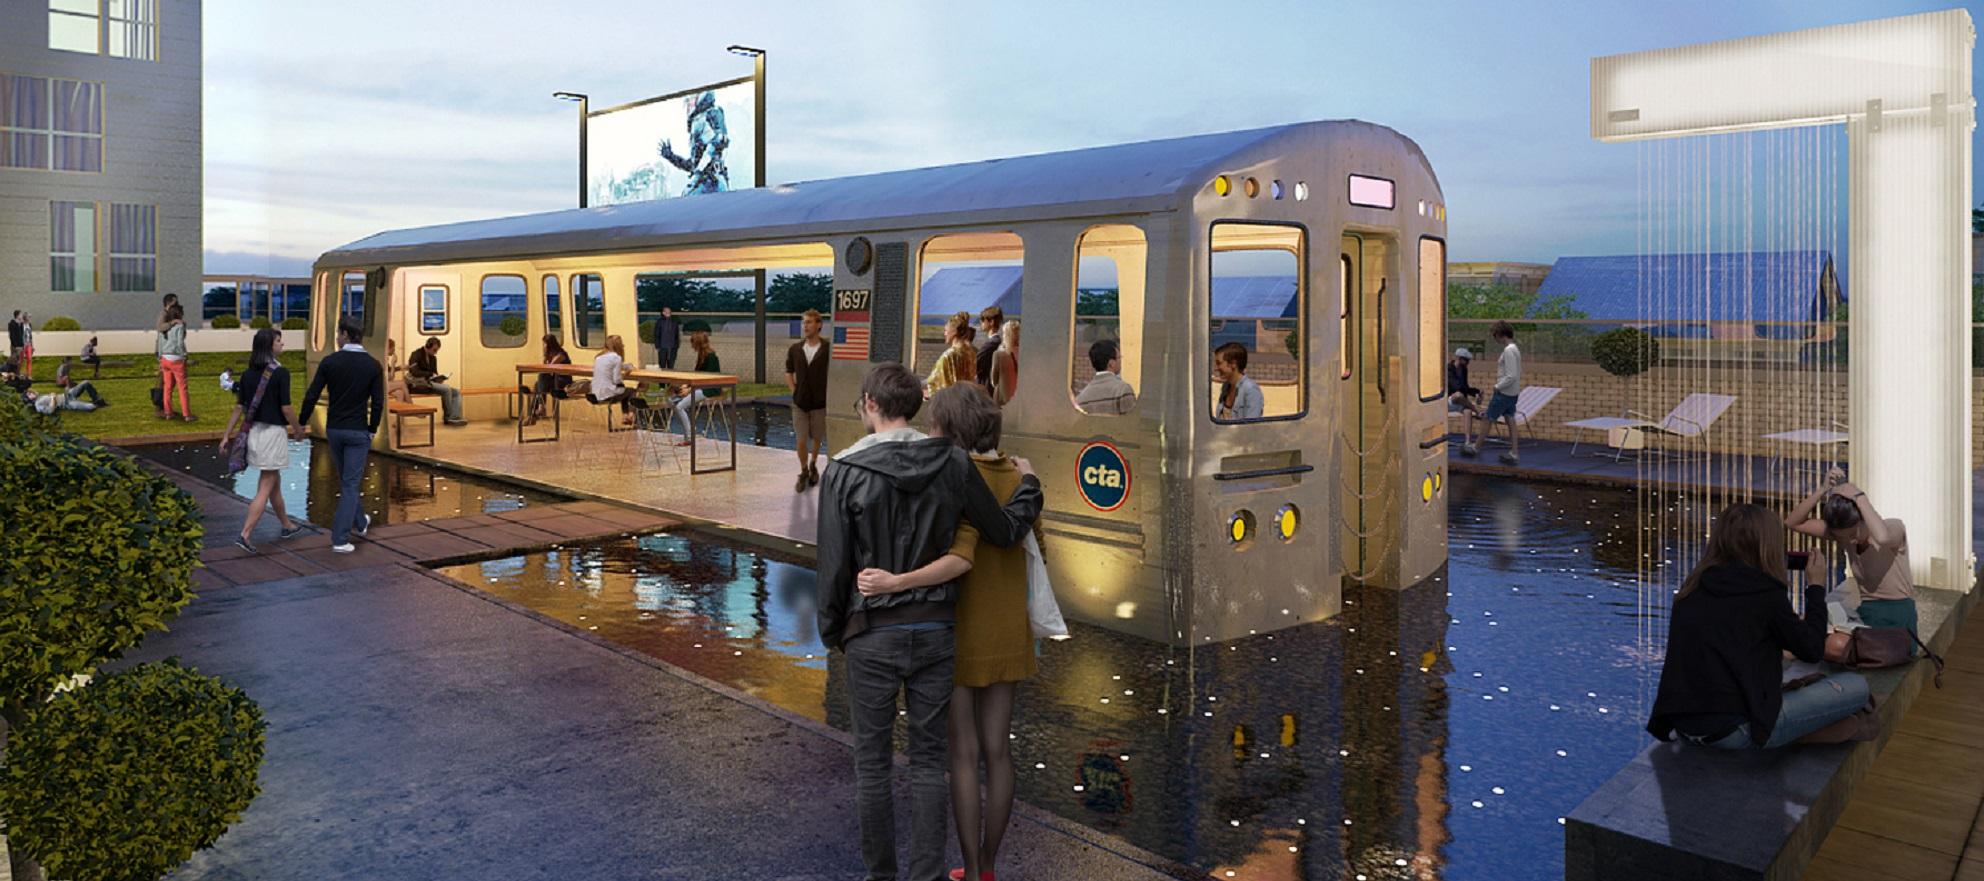 Logan Square building fully embodies 'transit-friendly'